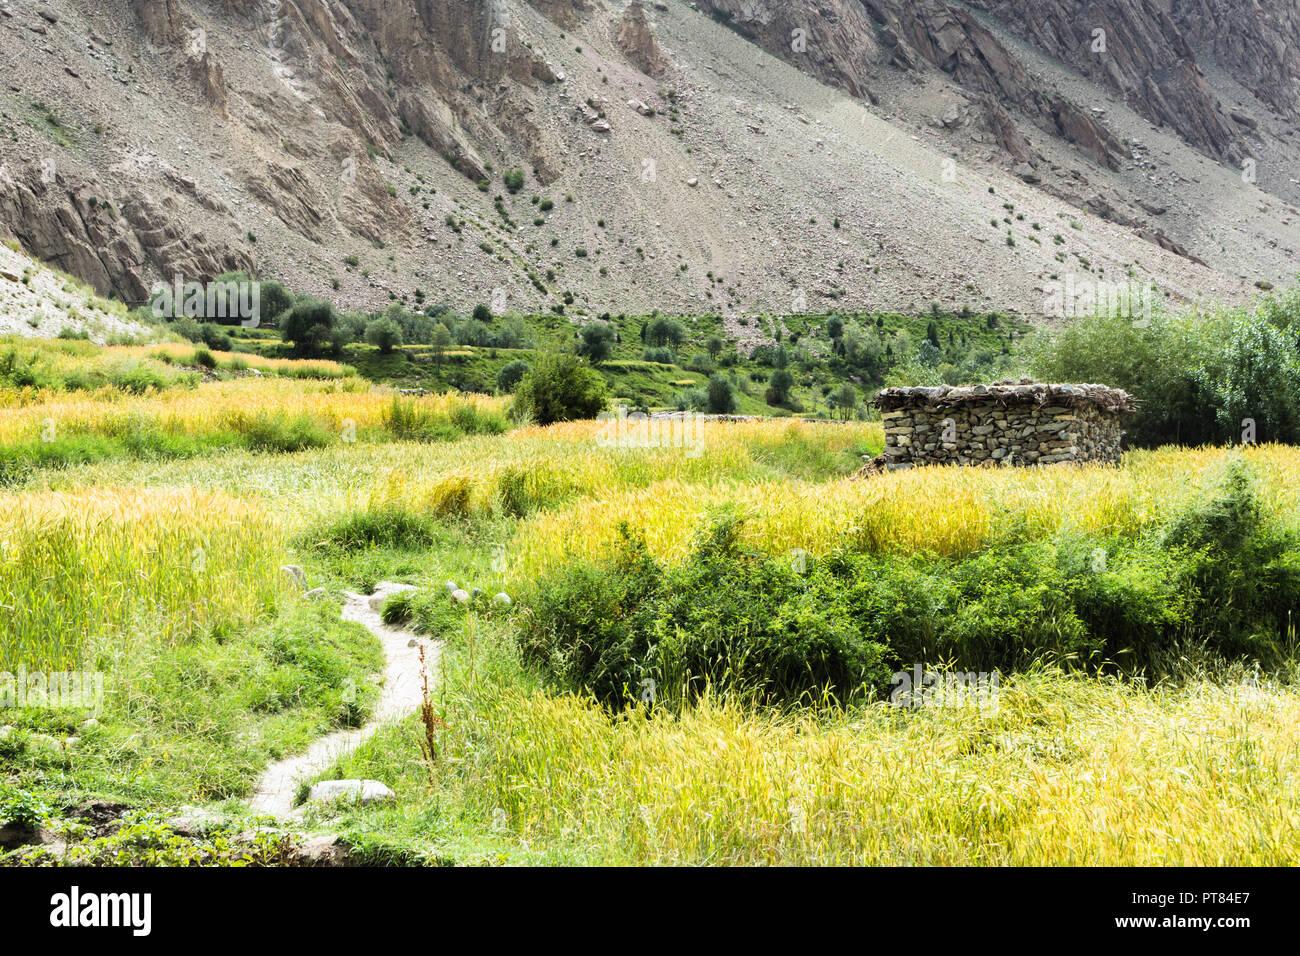 Wheat fields near Hushe village, Gilgit-Baltistan, Pakistan - Stock Image